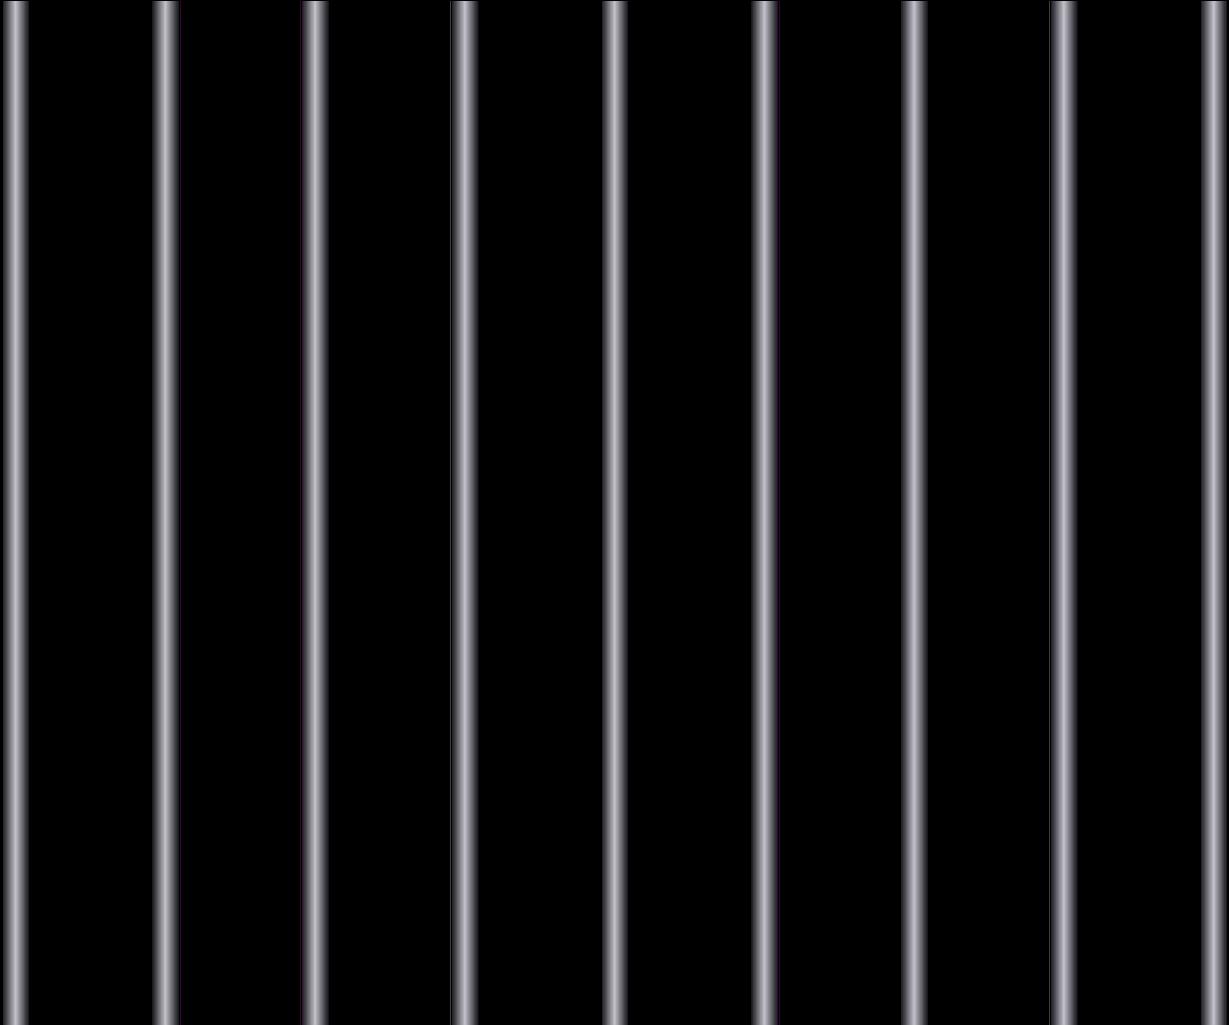 HD Behind Bars Transparent PNG Image Download.